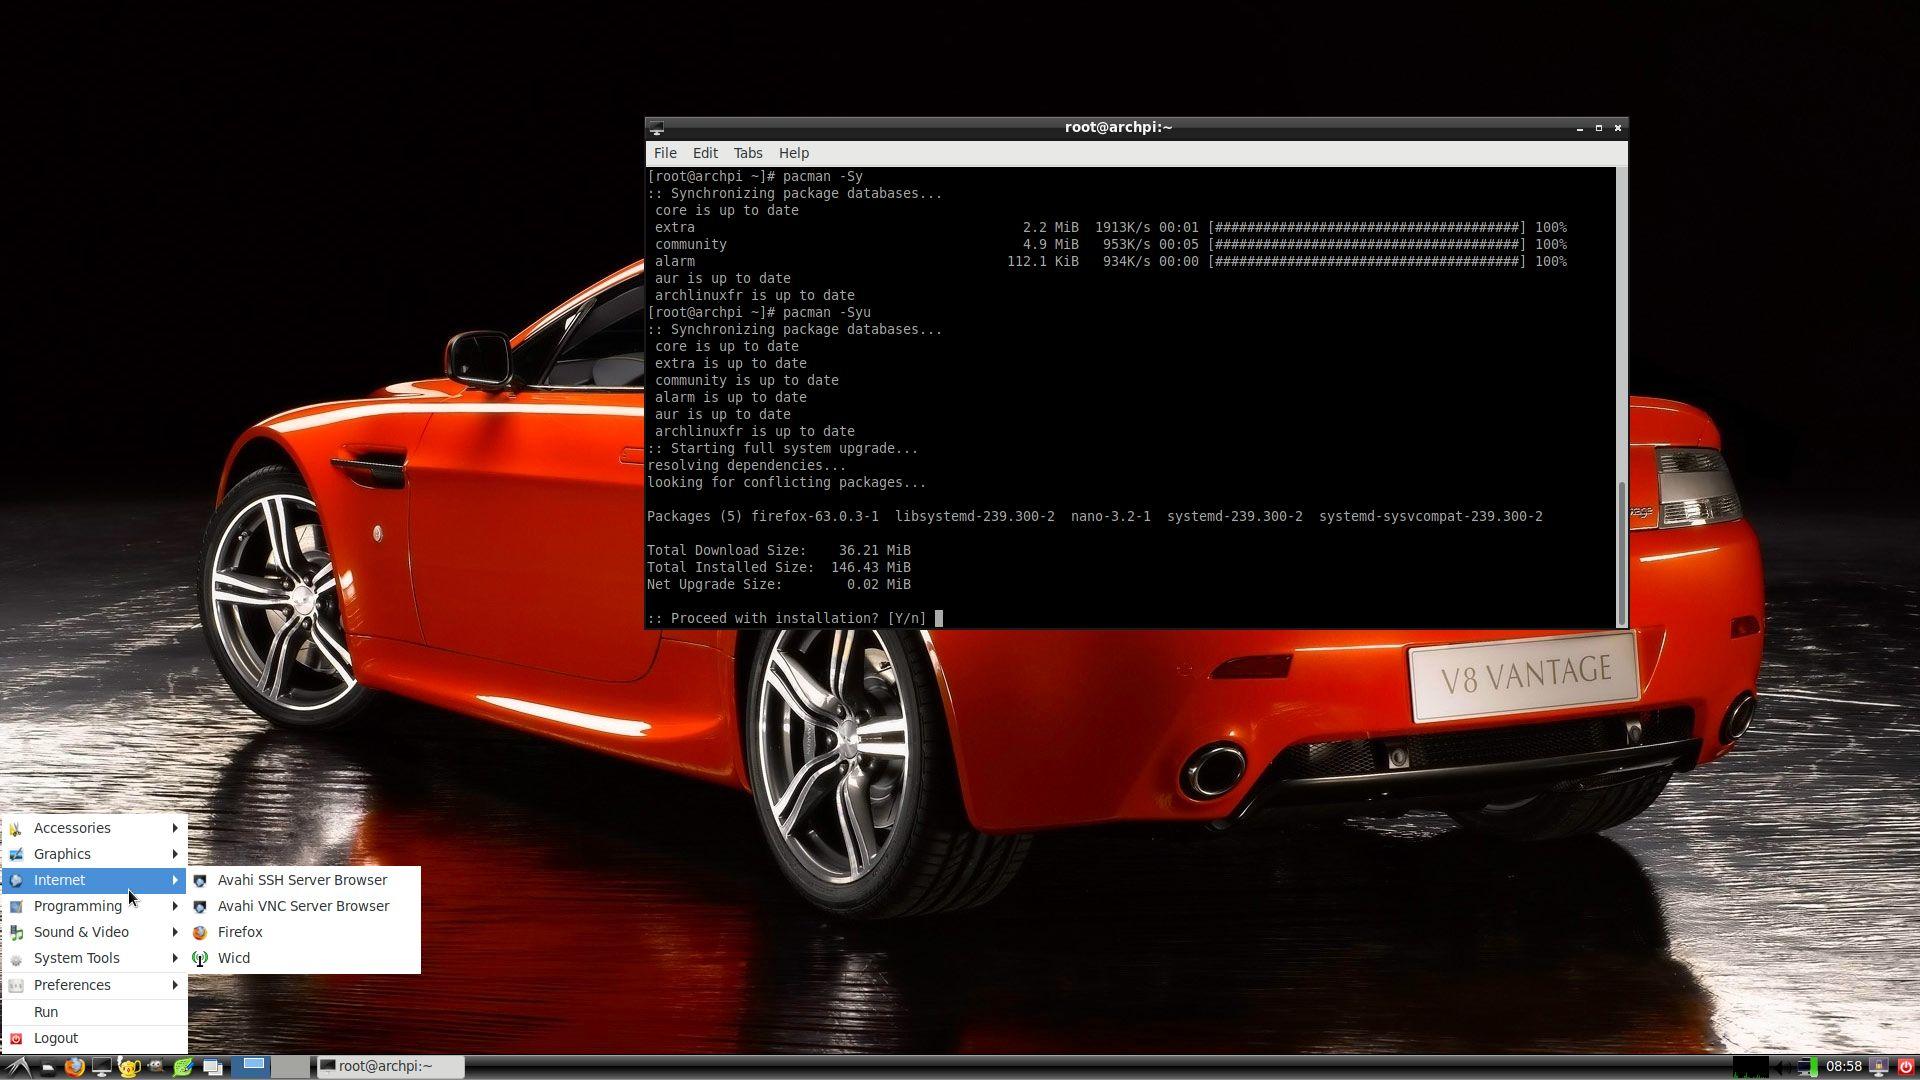 Arch linux raspberry pi 3 b+ download